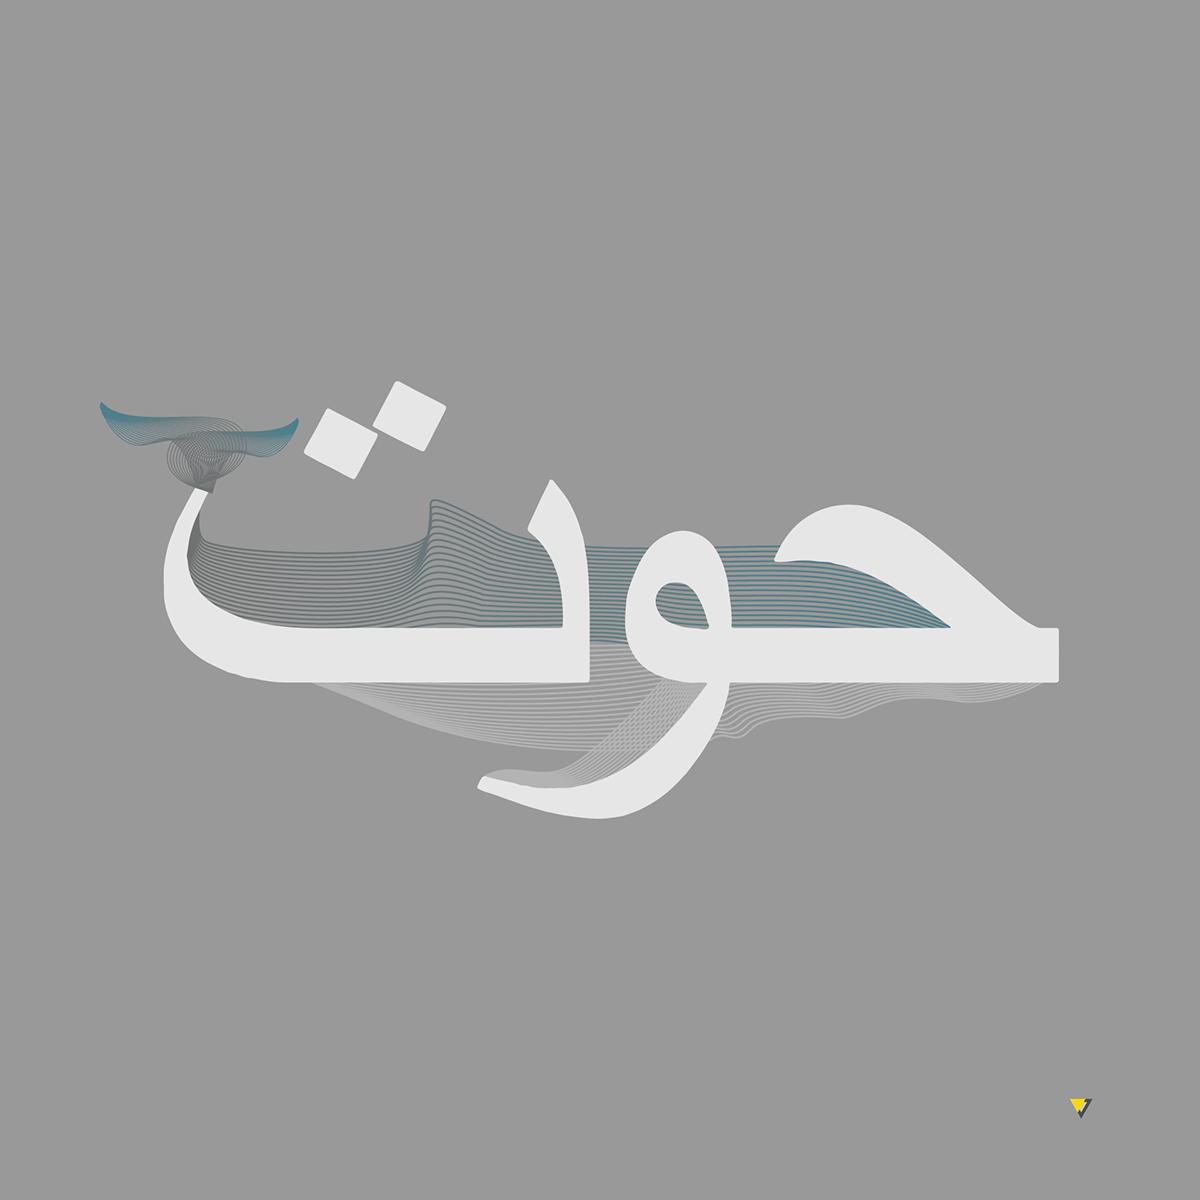 arabe arabic Baleia ILLUSTRATION  Ilustração language lingua palavra Whale word